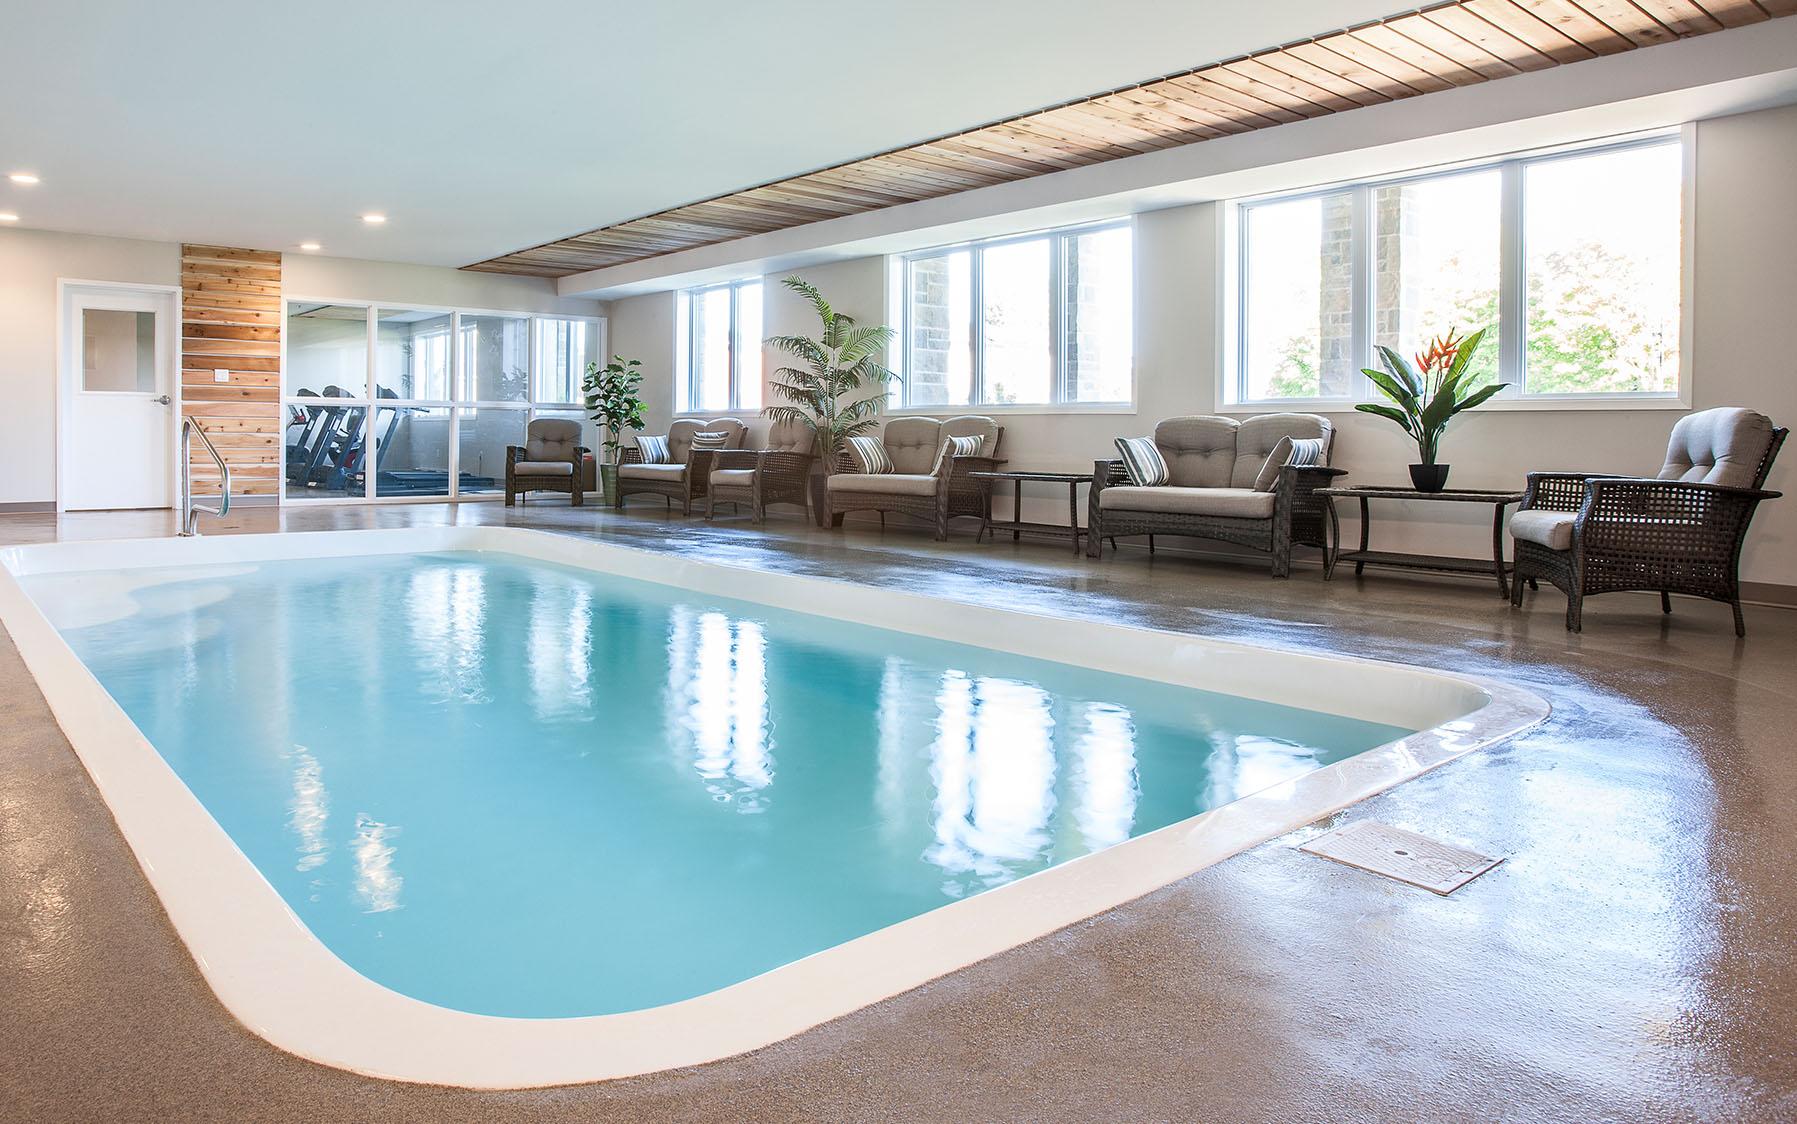 Thetford mines r sidence le renaissance for Renaissance piscine